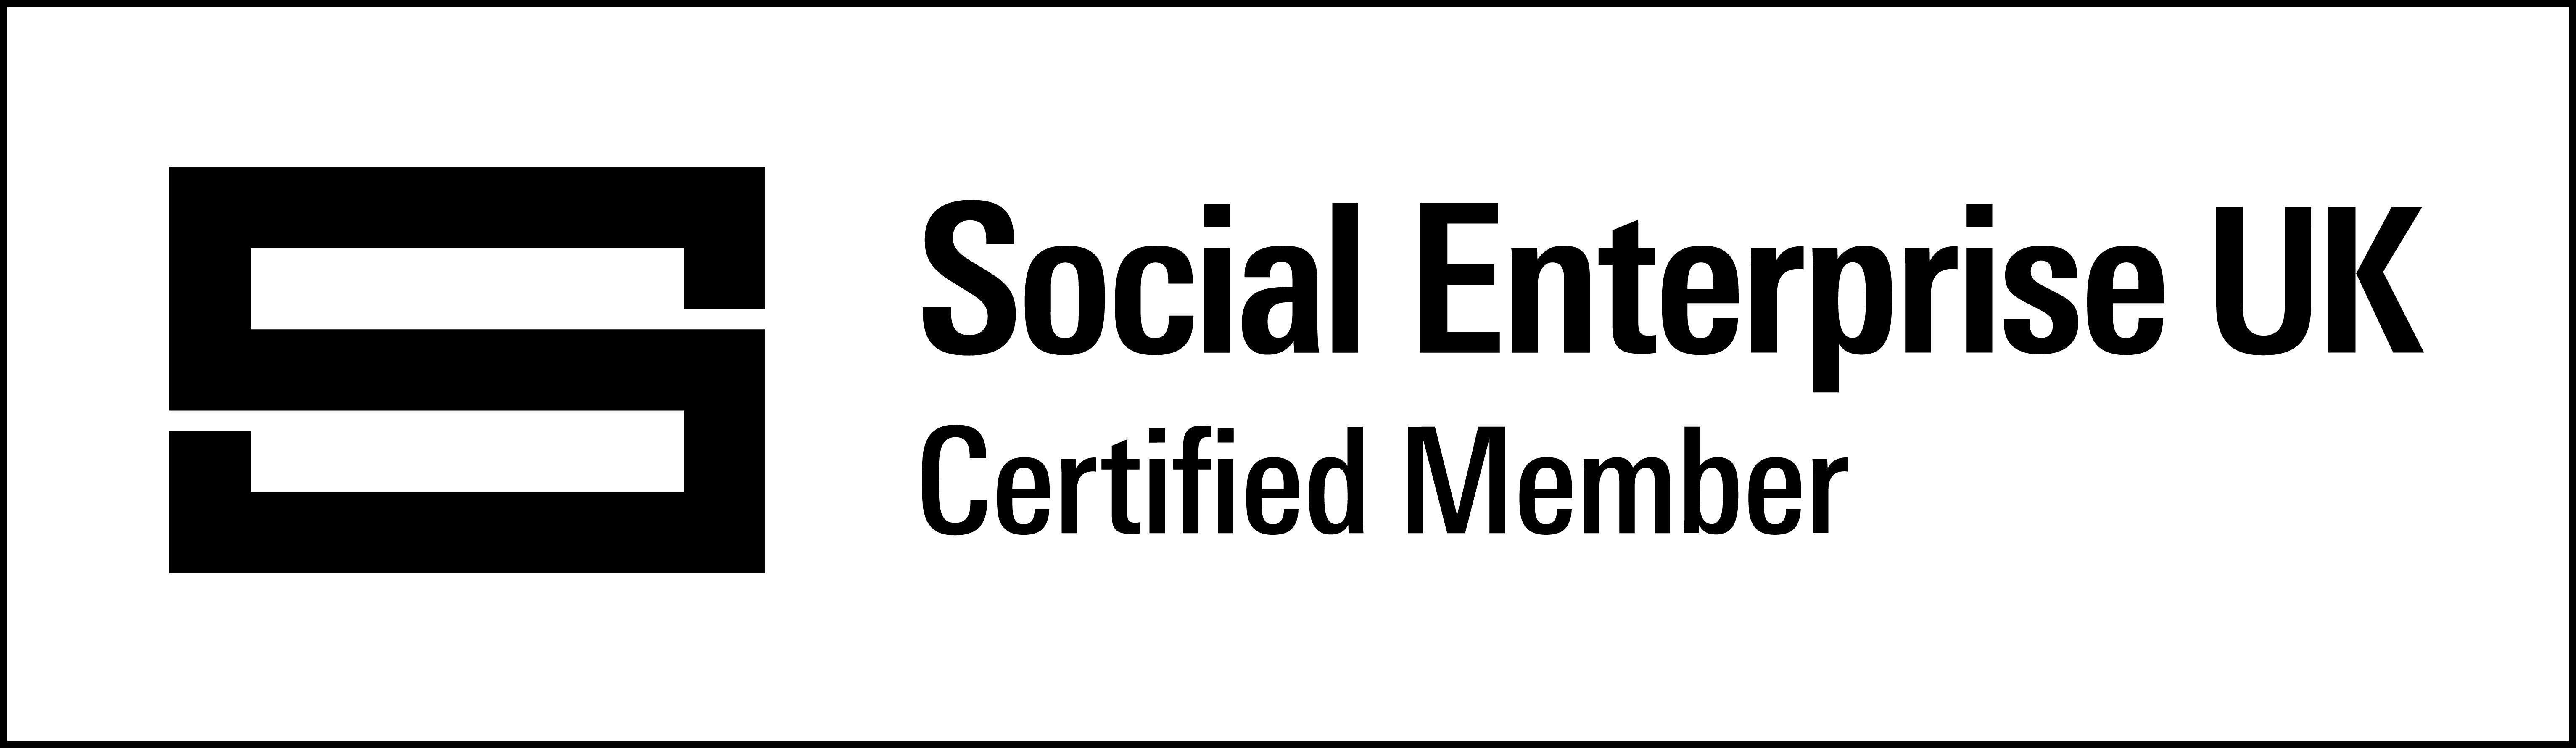 Social Enterprise UK Certified